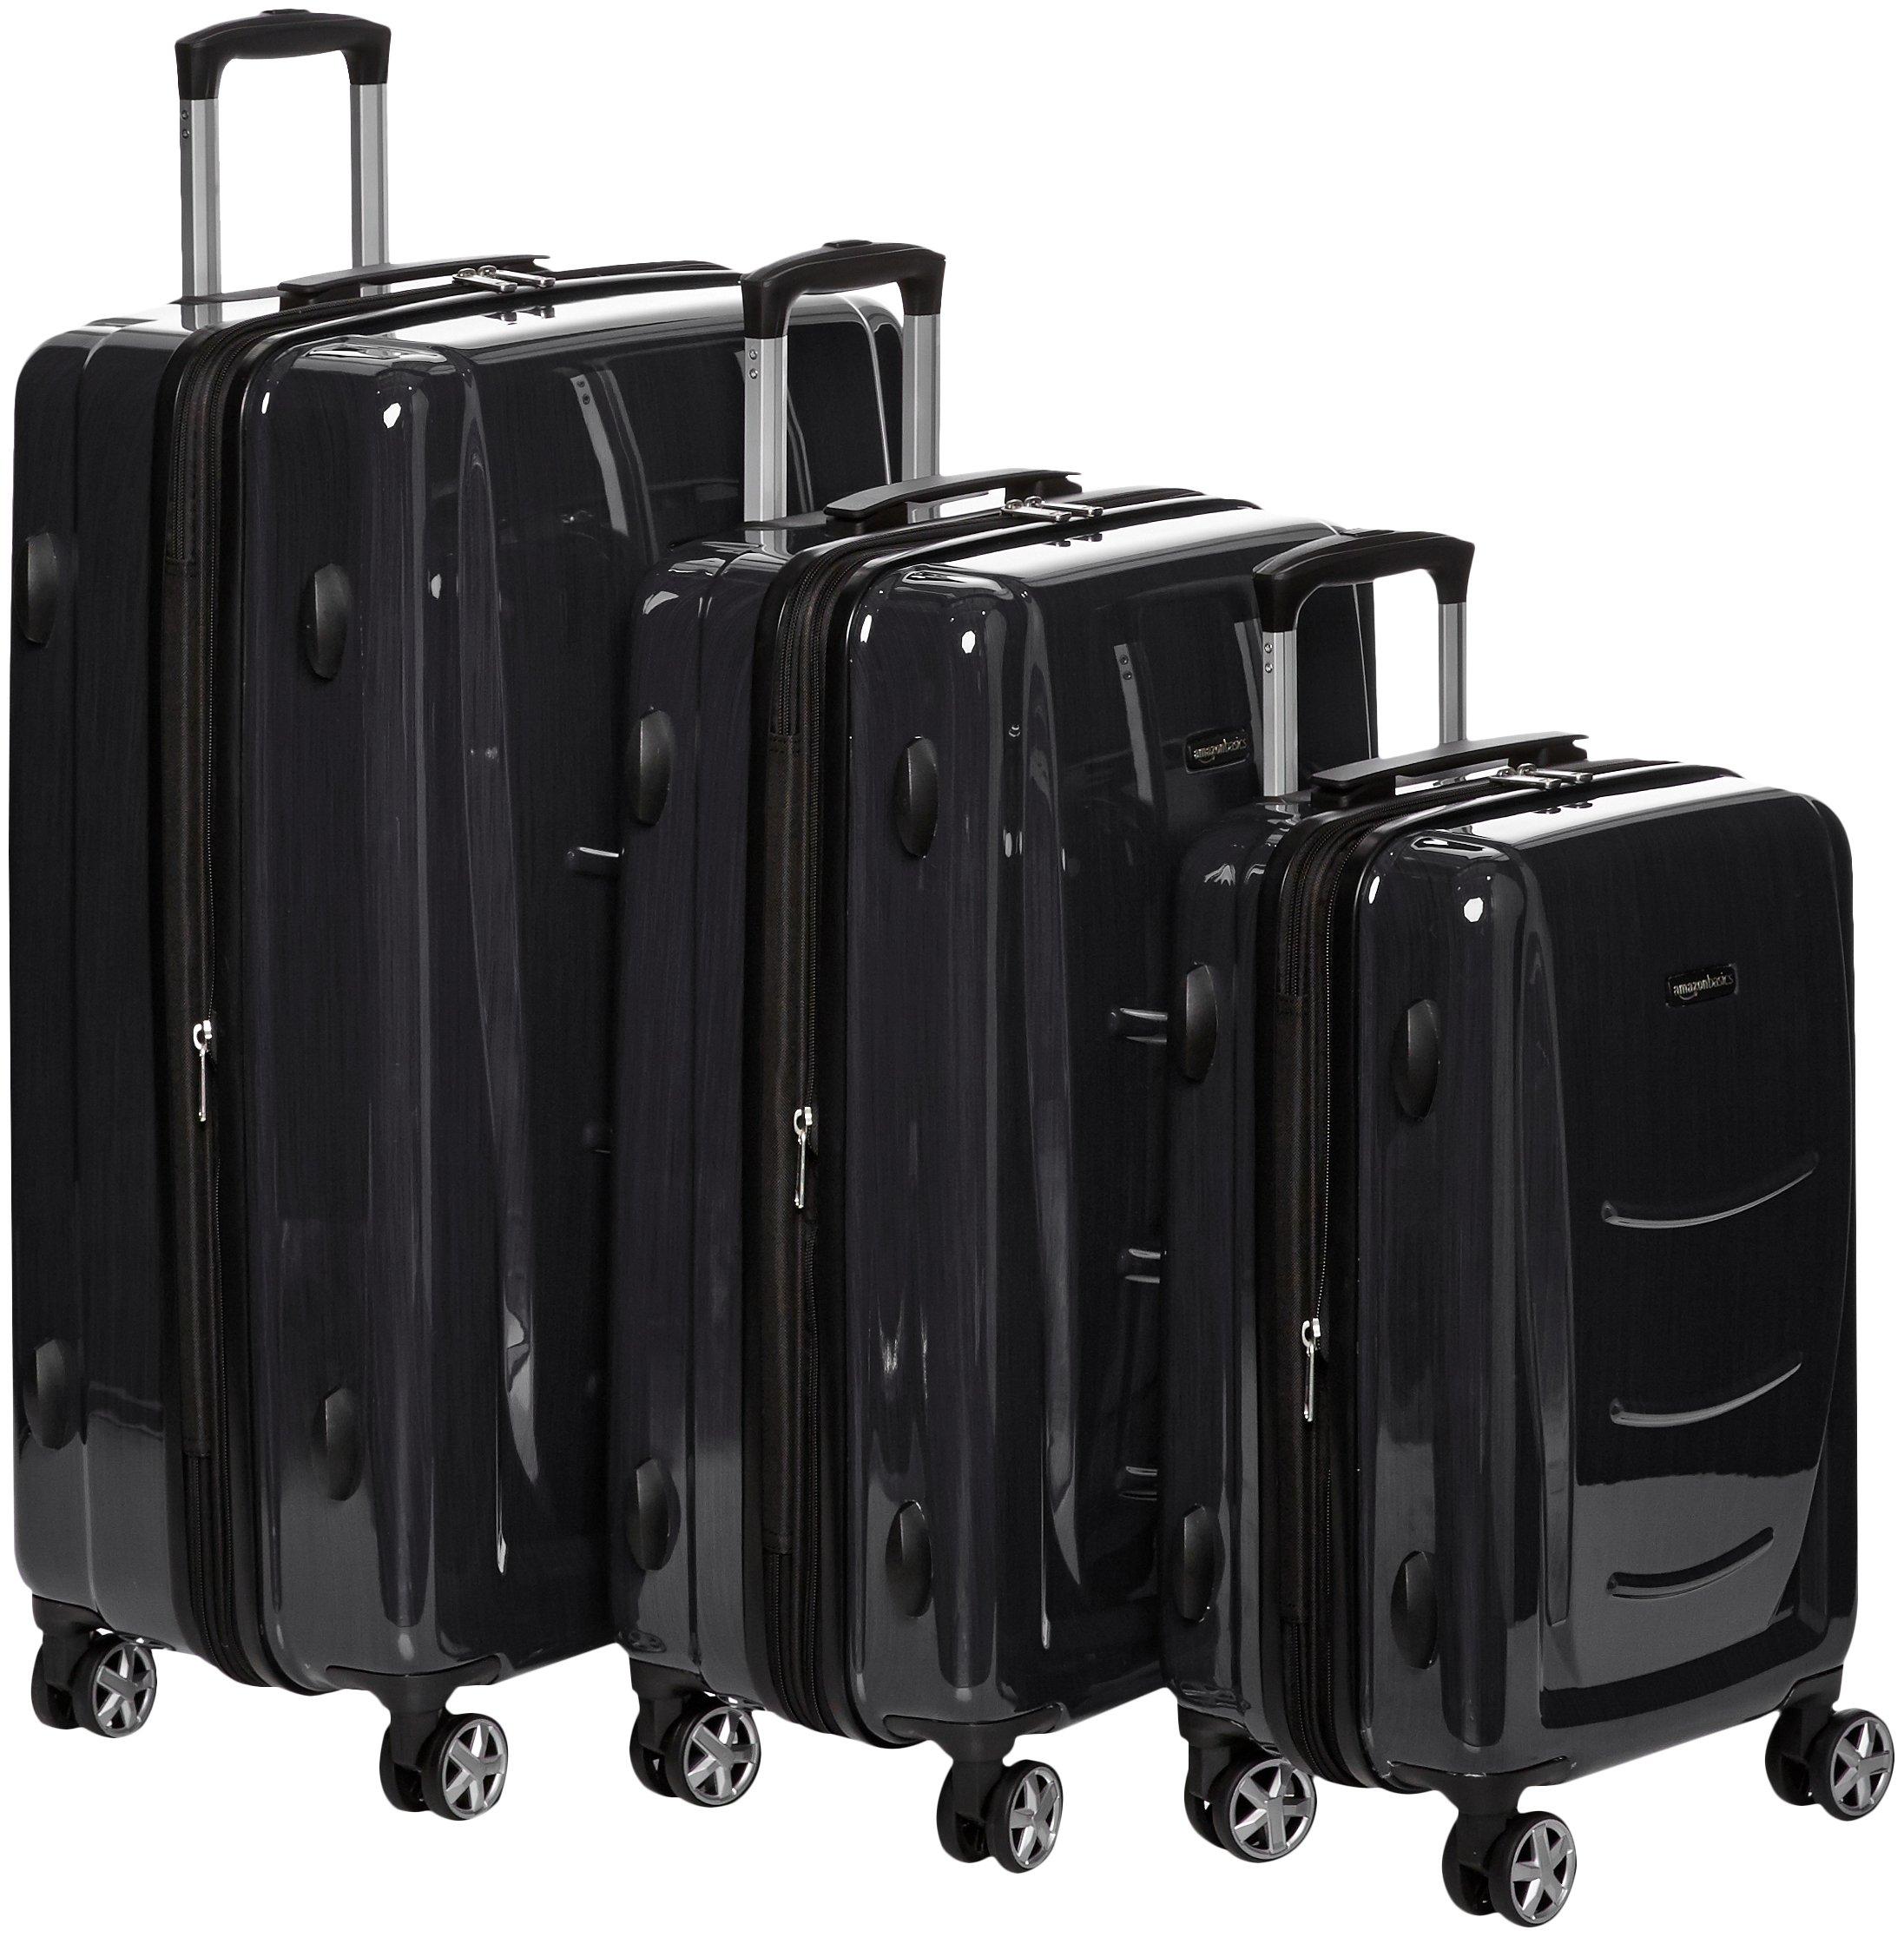 AmazonBasics Hardshell Spinner, 3 Piece Set - 20'', 24'', 28'', Slate Grey